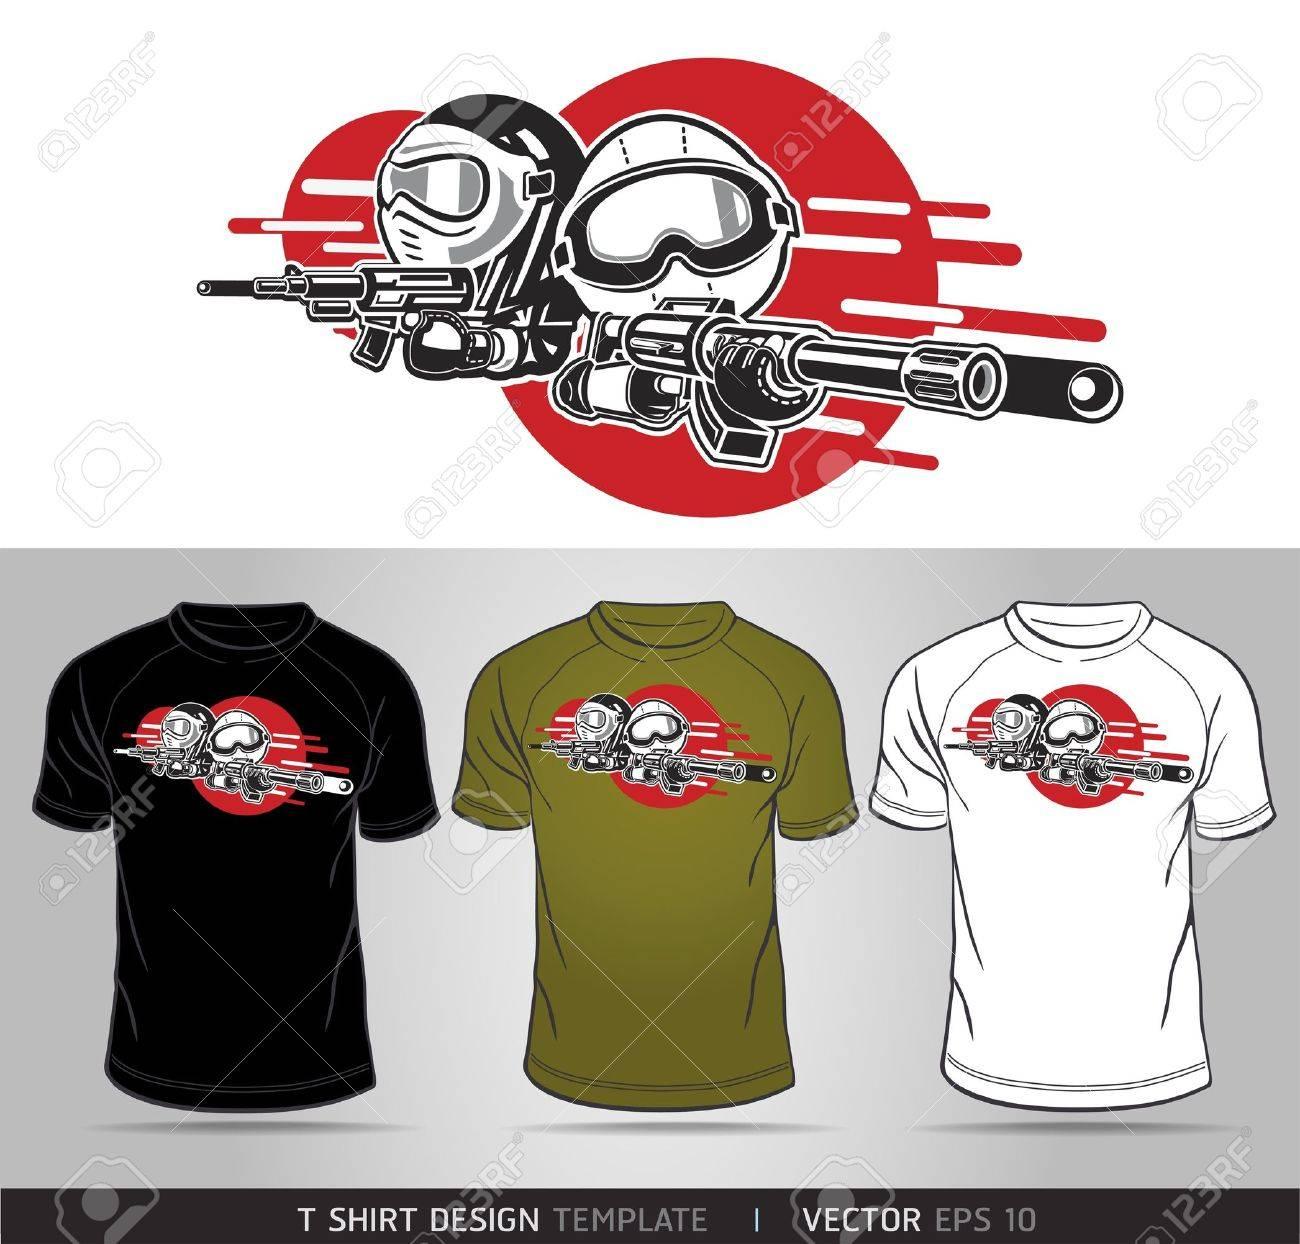 Shirt design vector - Cartoon Boy And Girl Play Airsoft Guns Vector T Shirt Design Stock Vector